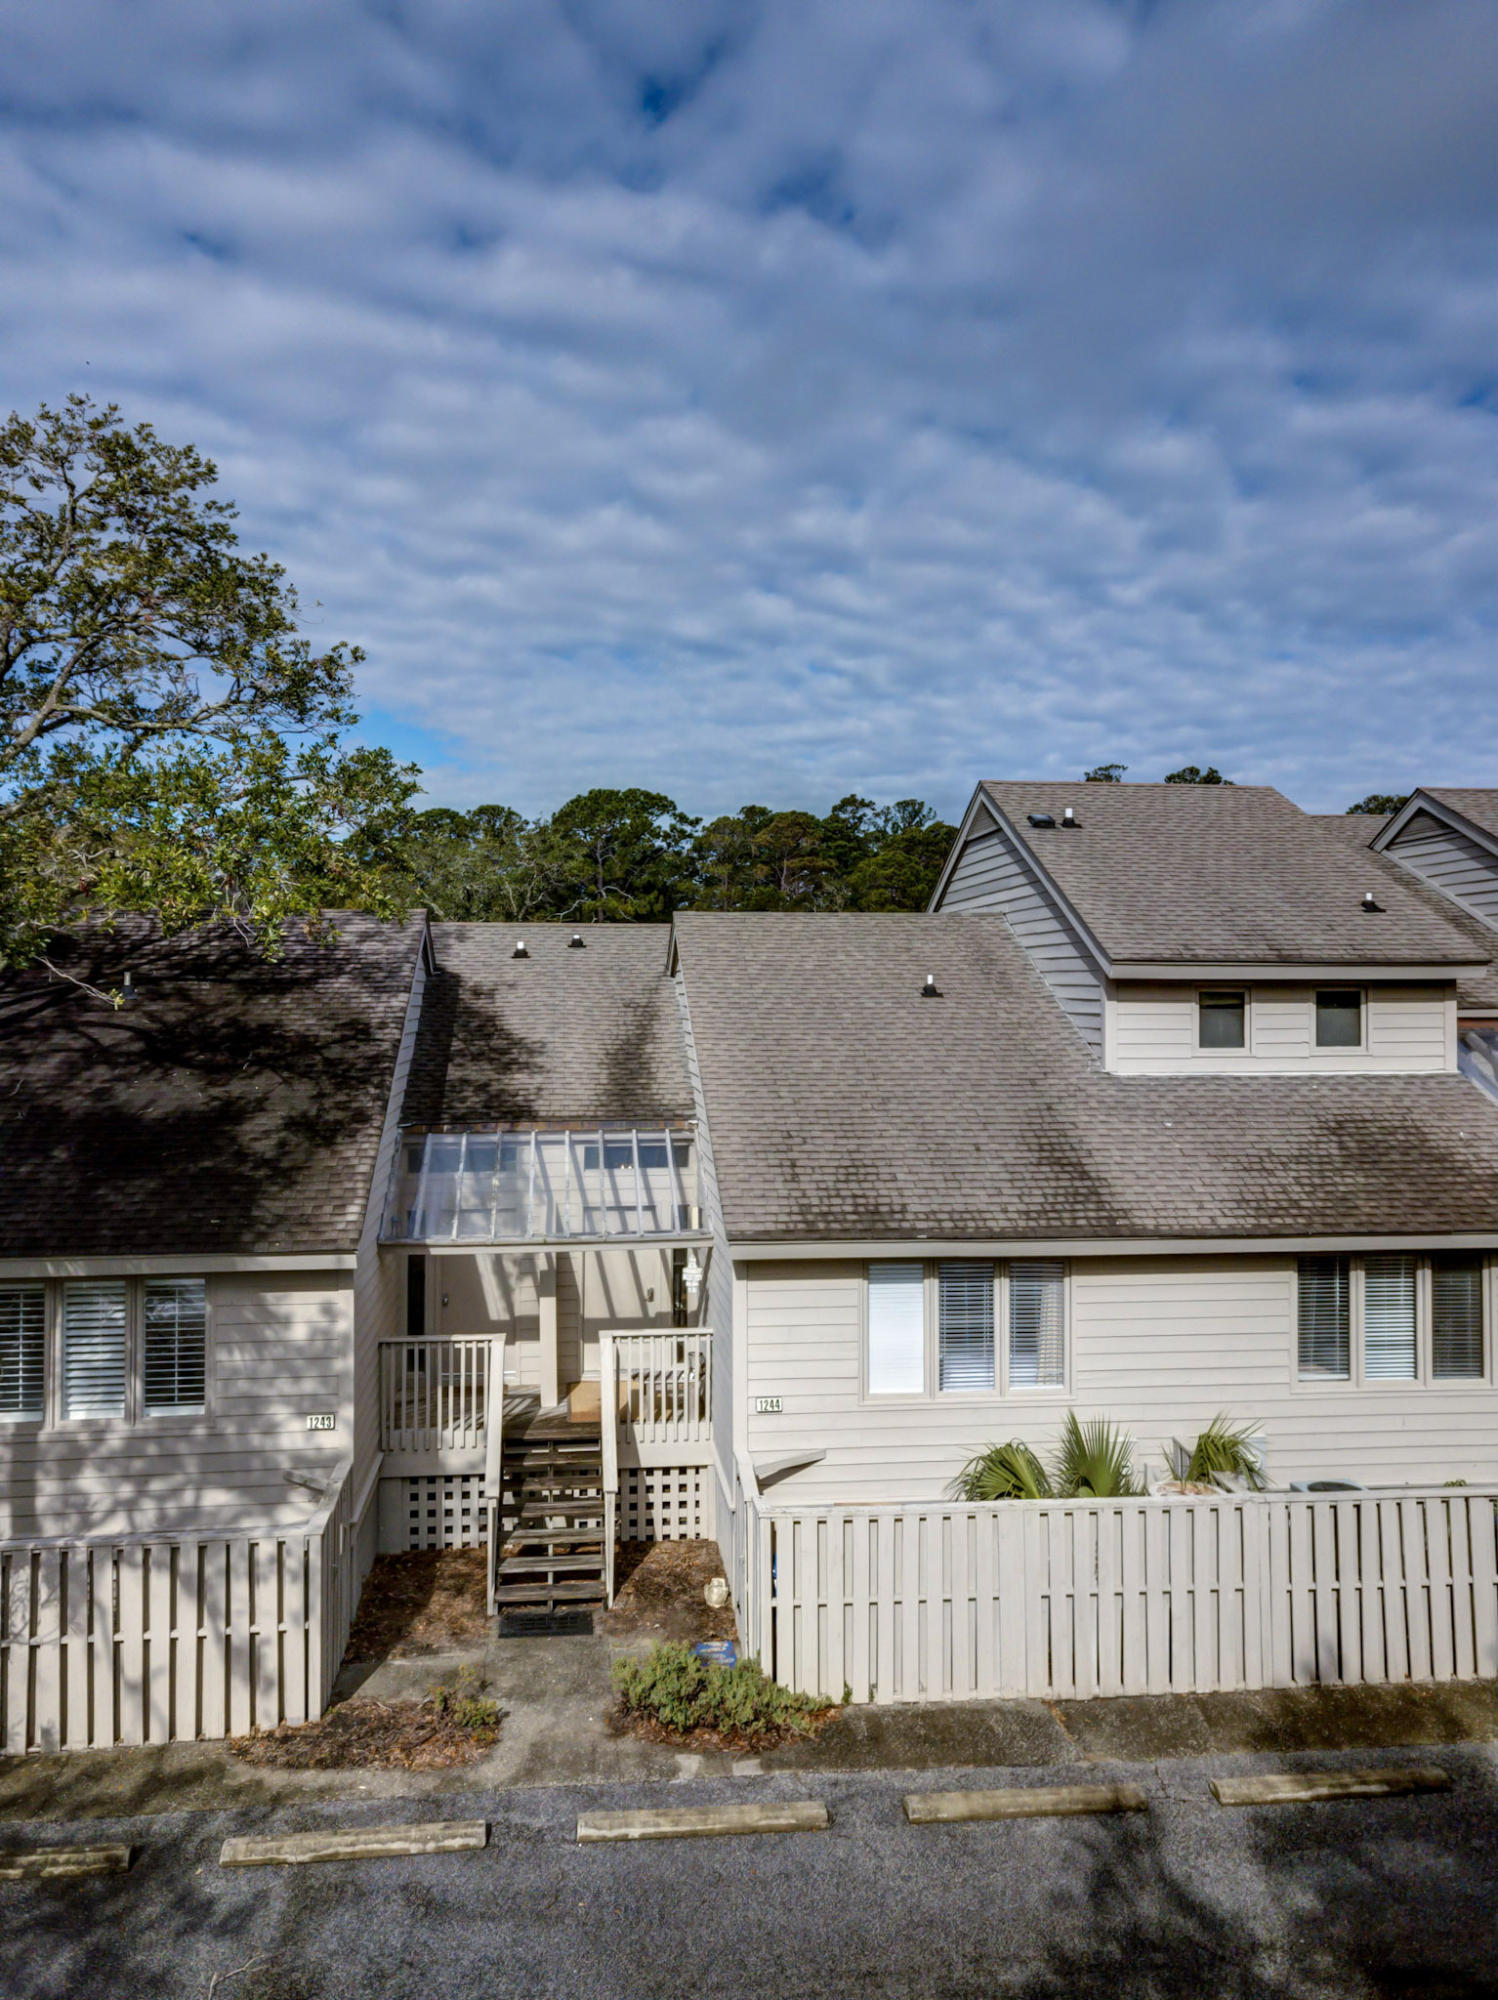 Creek Watch Villas Homes For Sale - 1244 Creek Watch, Johns Island, SC - 21